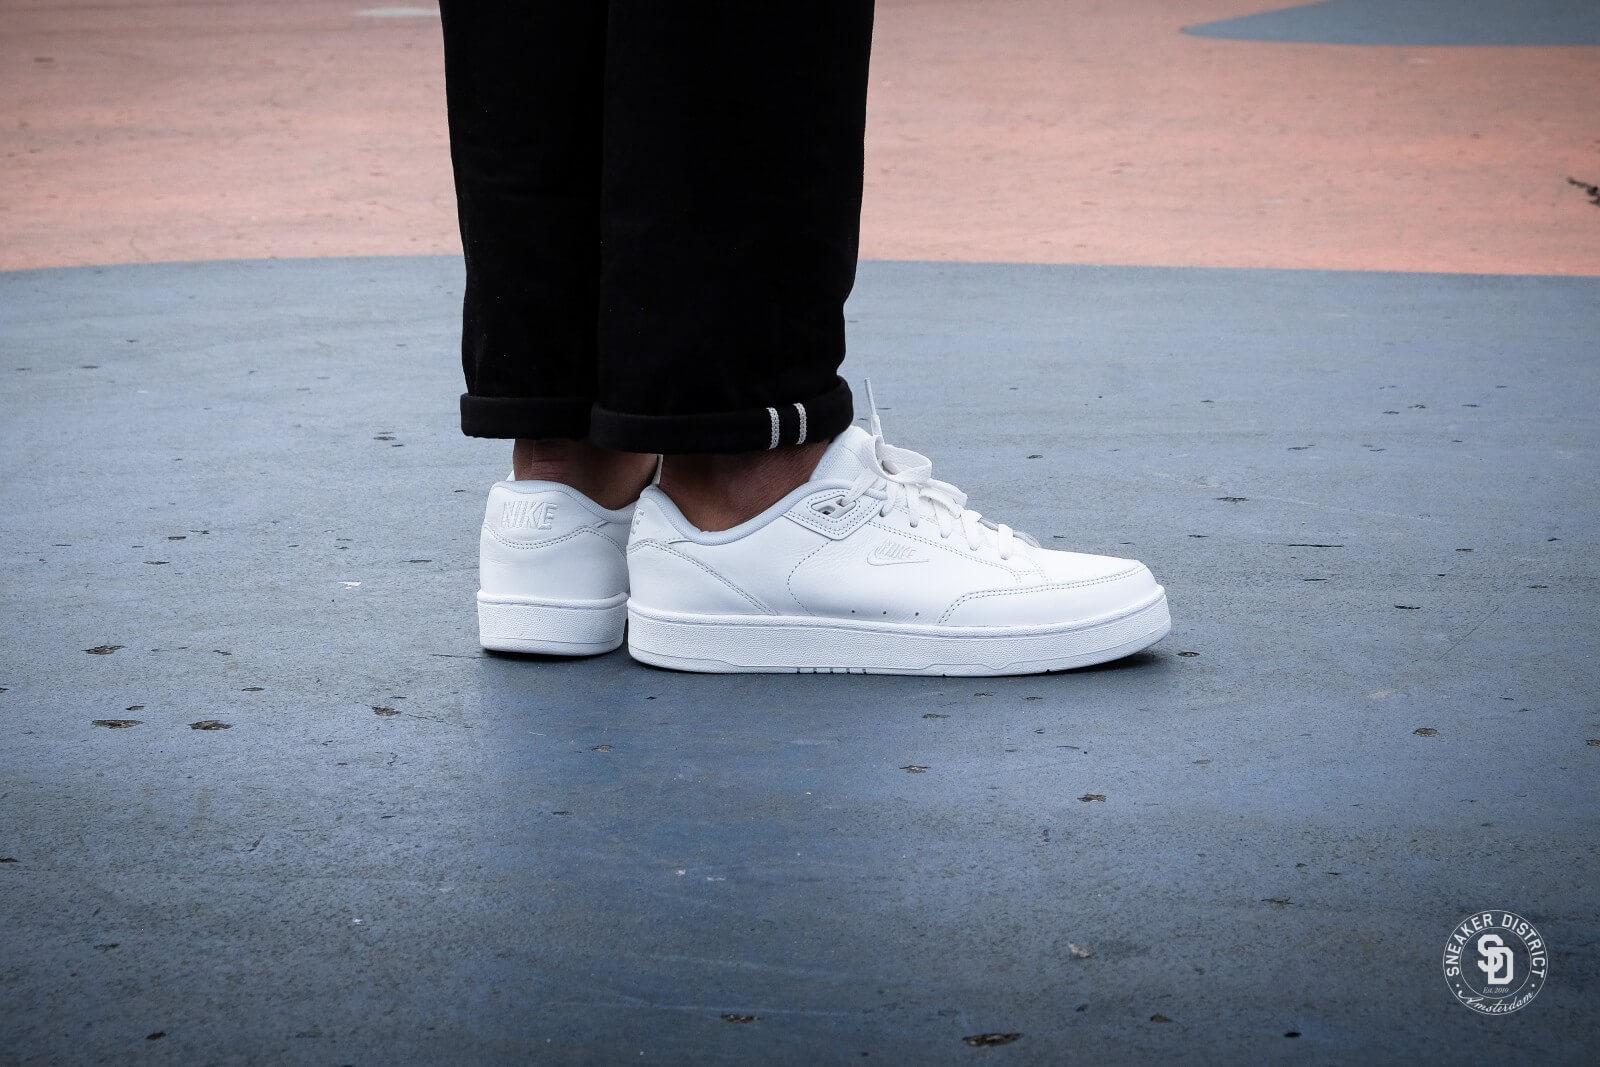 on sale 08009 58315 Nike Grandstand II Premium (Summit White Summit White White) -  associate-degree.de